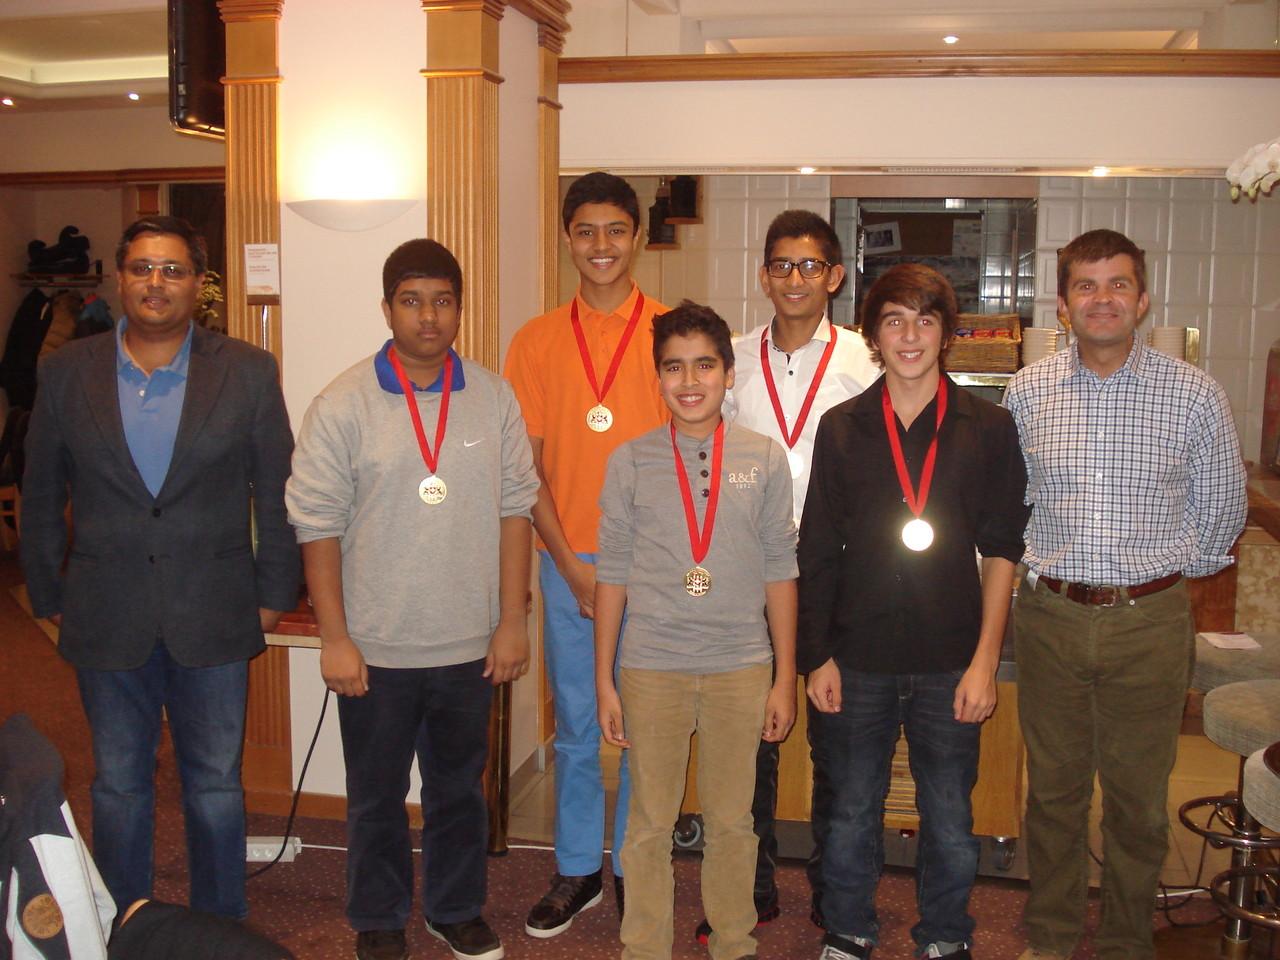 2013 Winners, l-r: Y.Sinh (Coach); Marishque Puvimamasinghe; Jai Sinh; Rohan Jain; Arjun Vinod; Aidan Andrews; J.Millar (Coach)